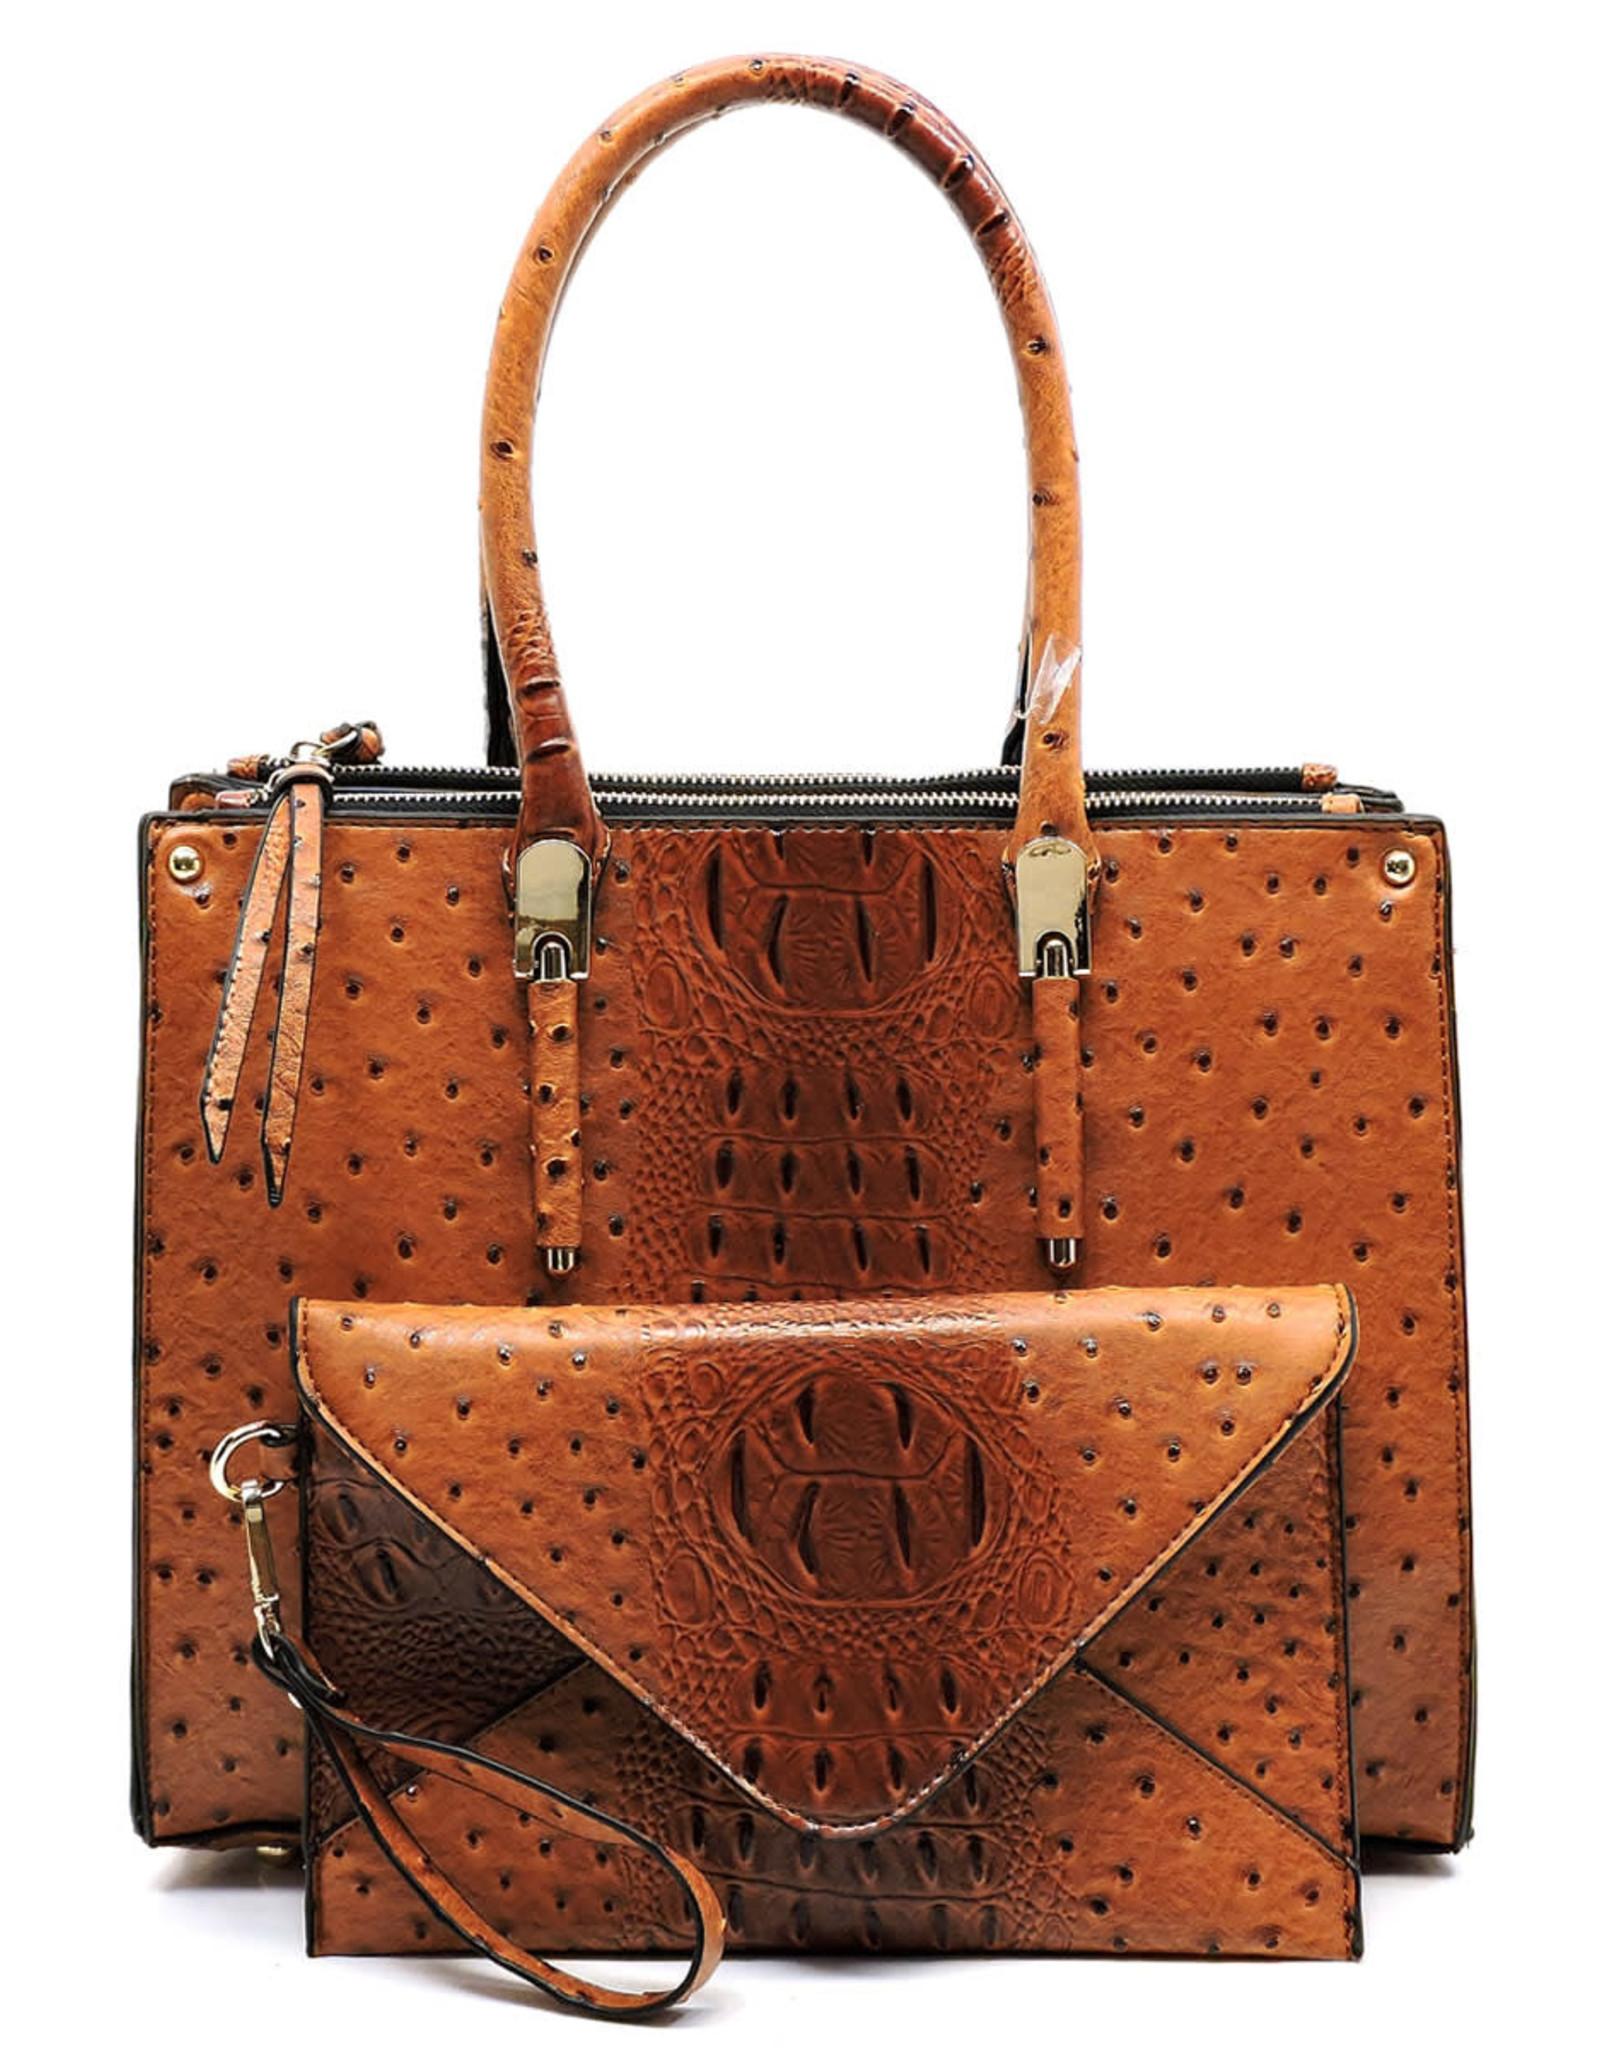 Rockin Croc Handbag + Clutch Set